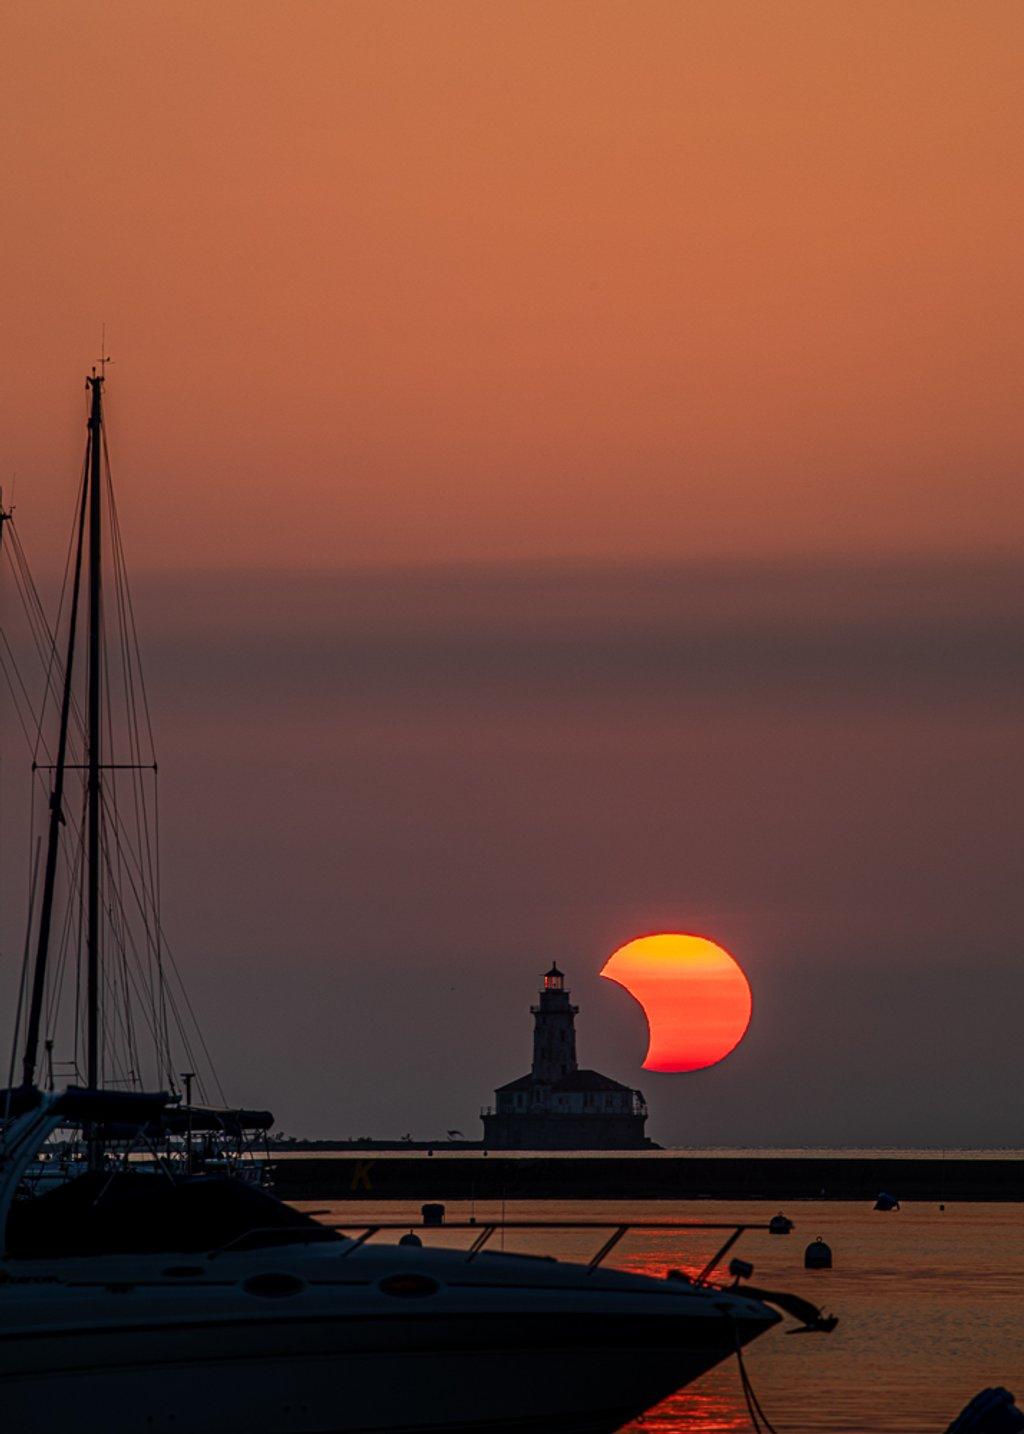 Solar Eclipse by jyokota